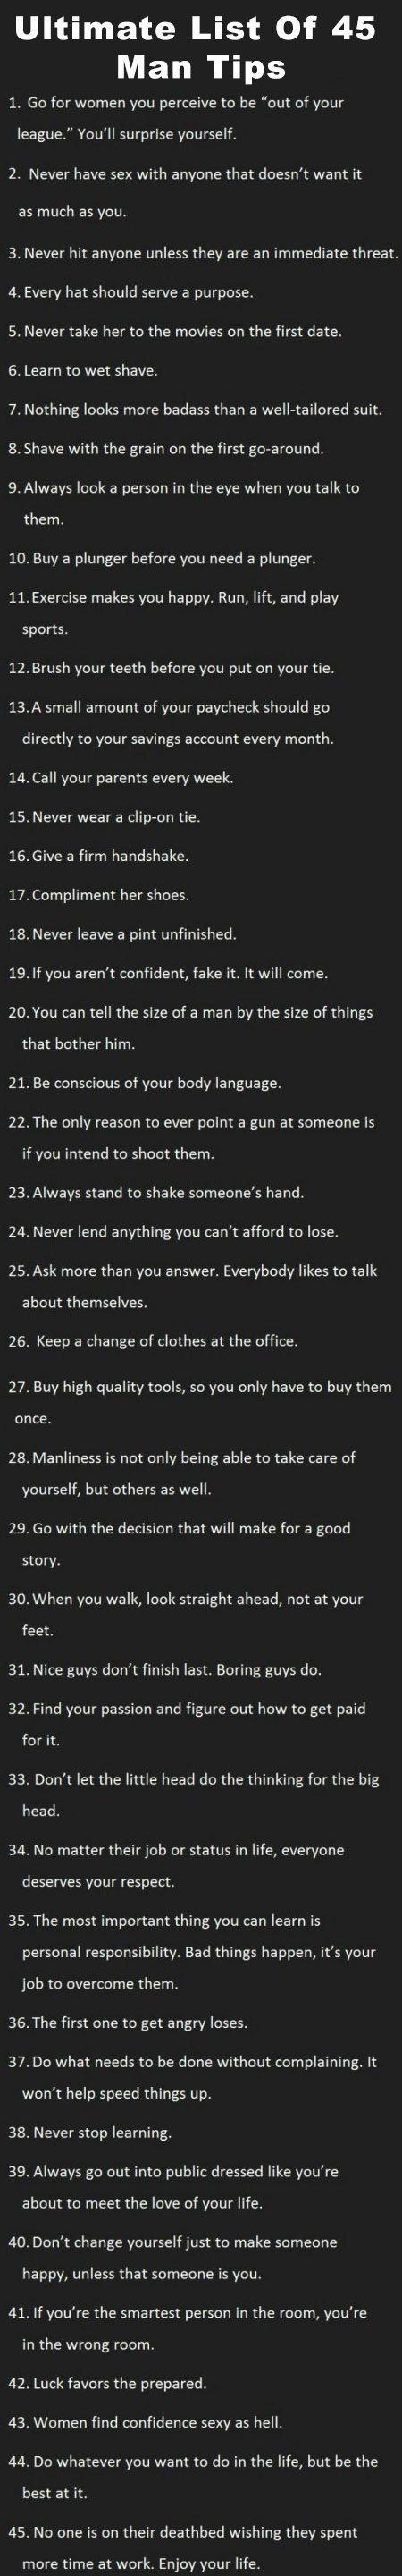 Ultimate-List-Of-45-Man-Tips #manresume not a bad list at all #realtalk